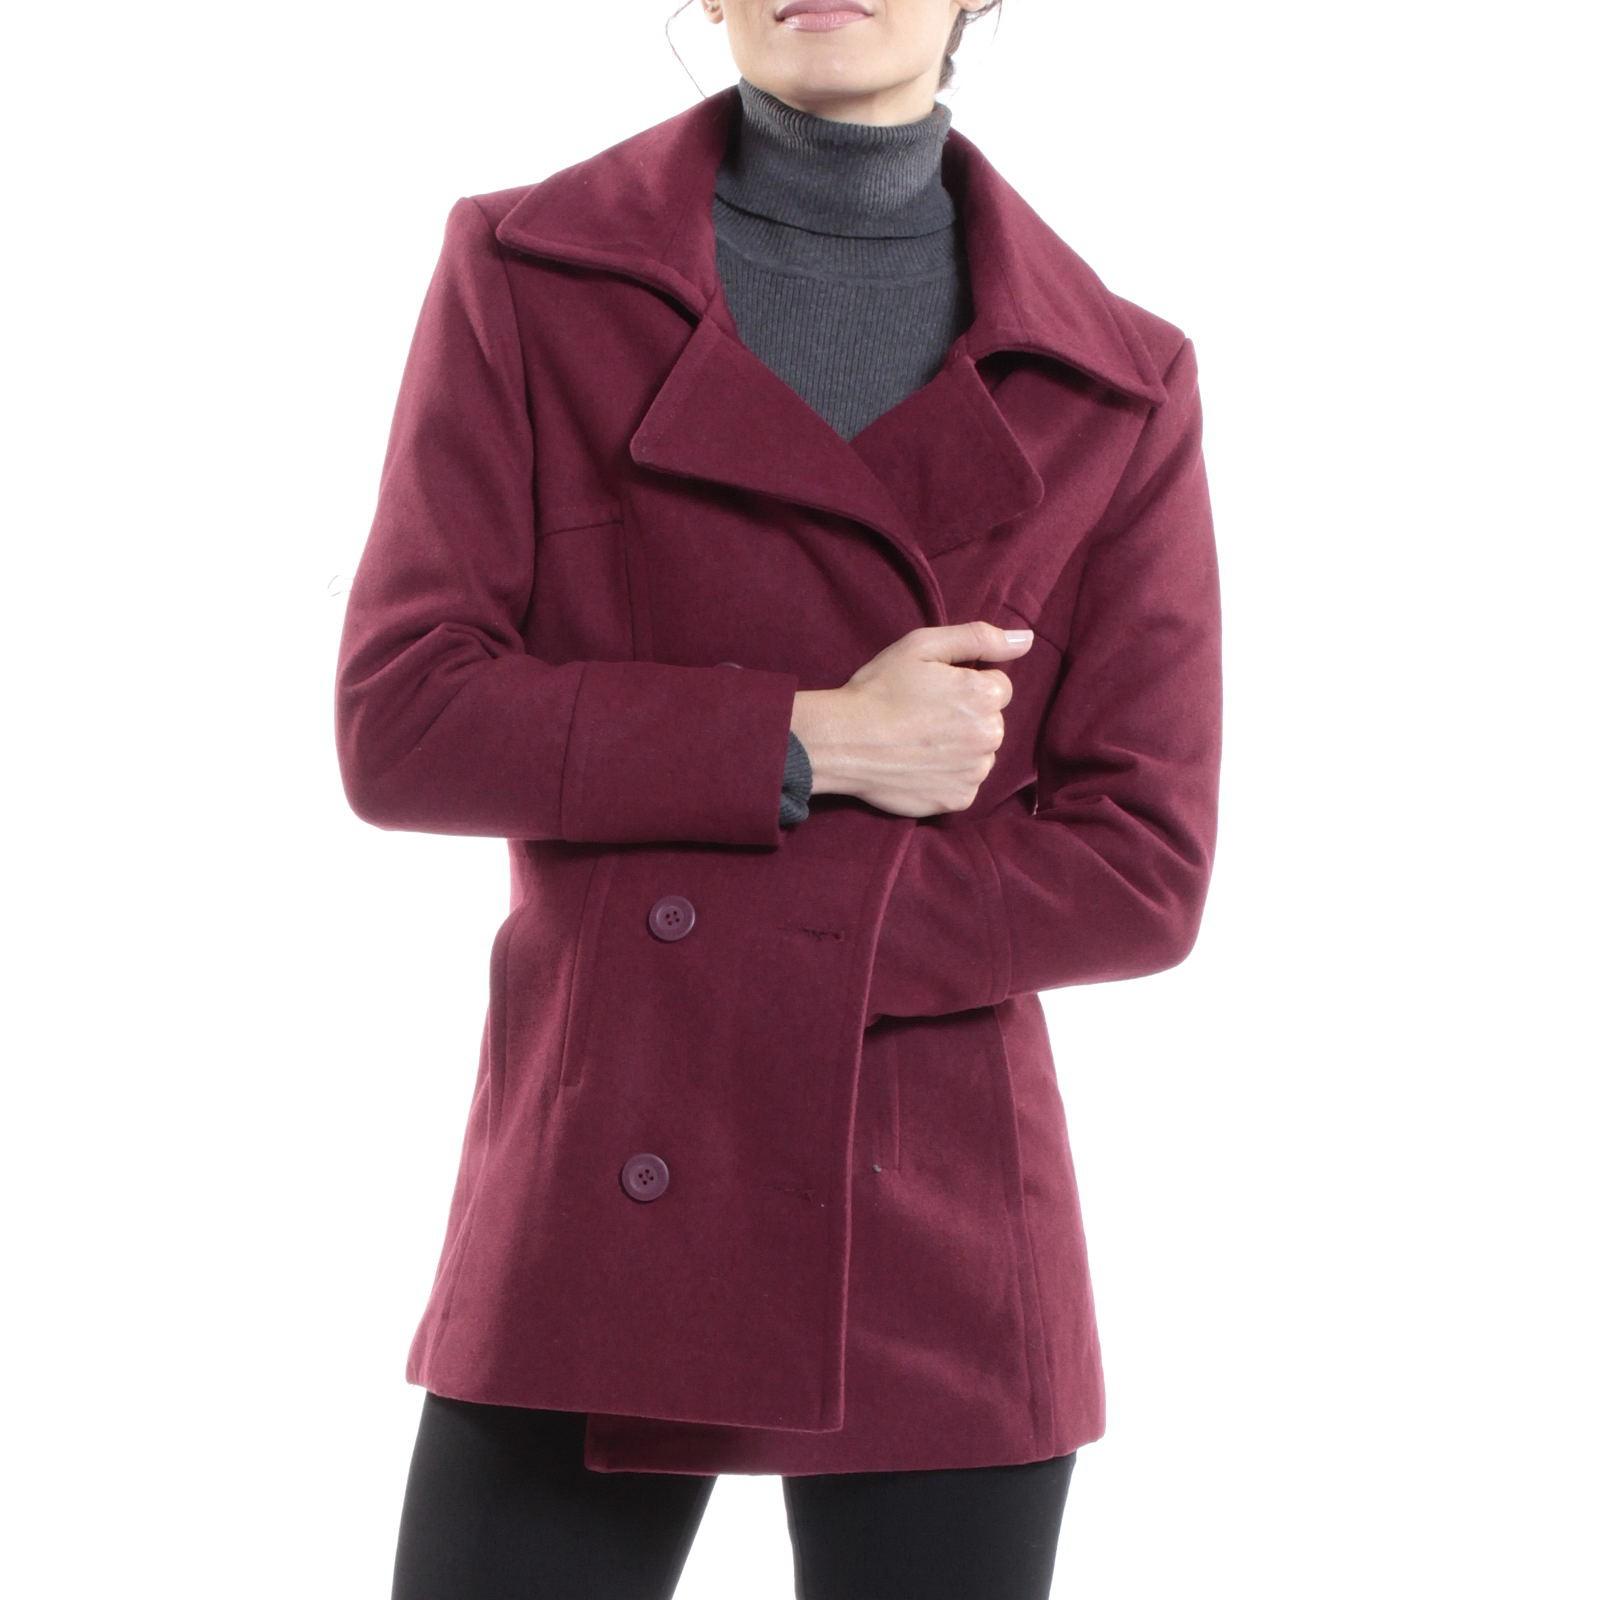 Alpine-Swiss-Emma-Womens-Peacoat-Jacket-Wool-Blazer-Double-Breasted-Overcoat-New thumbnail 33